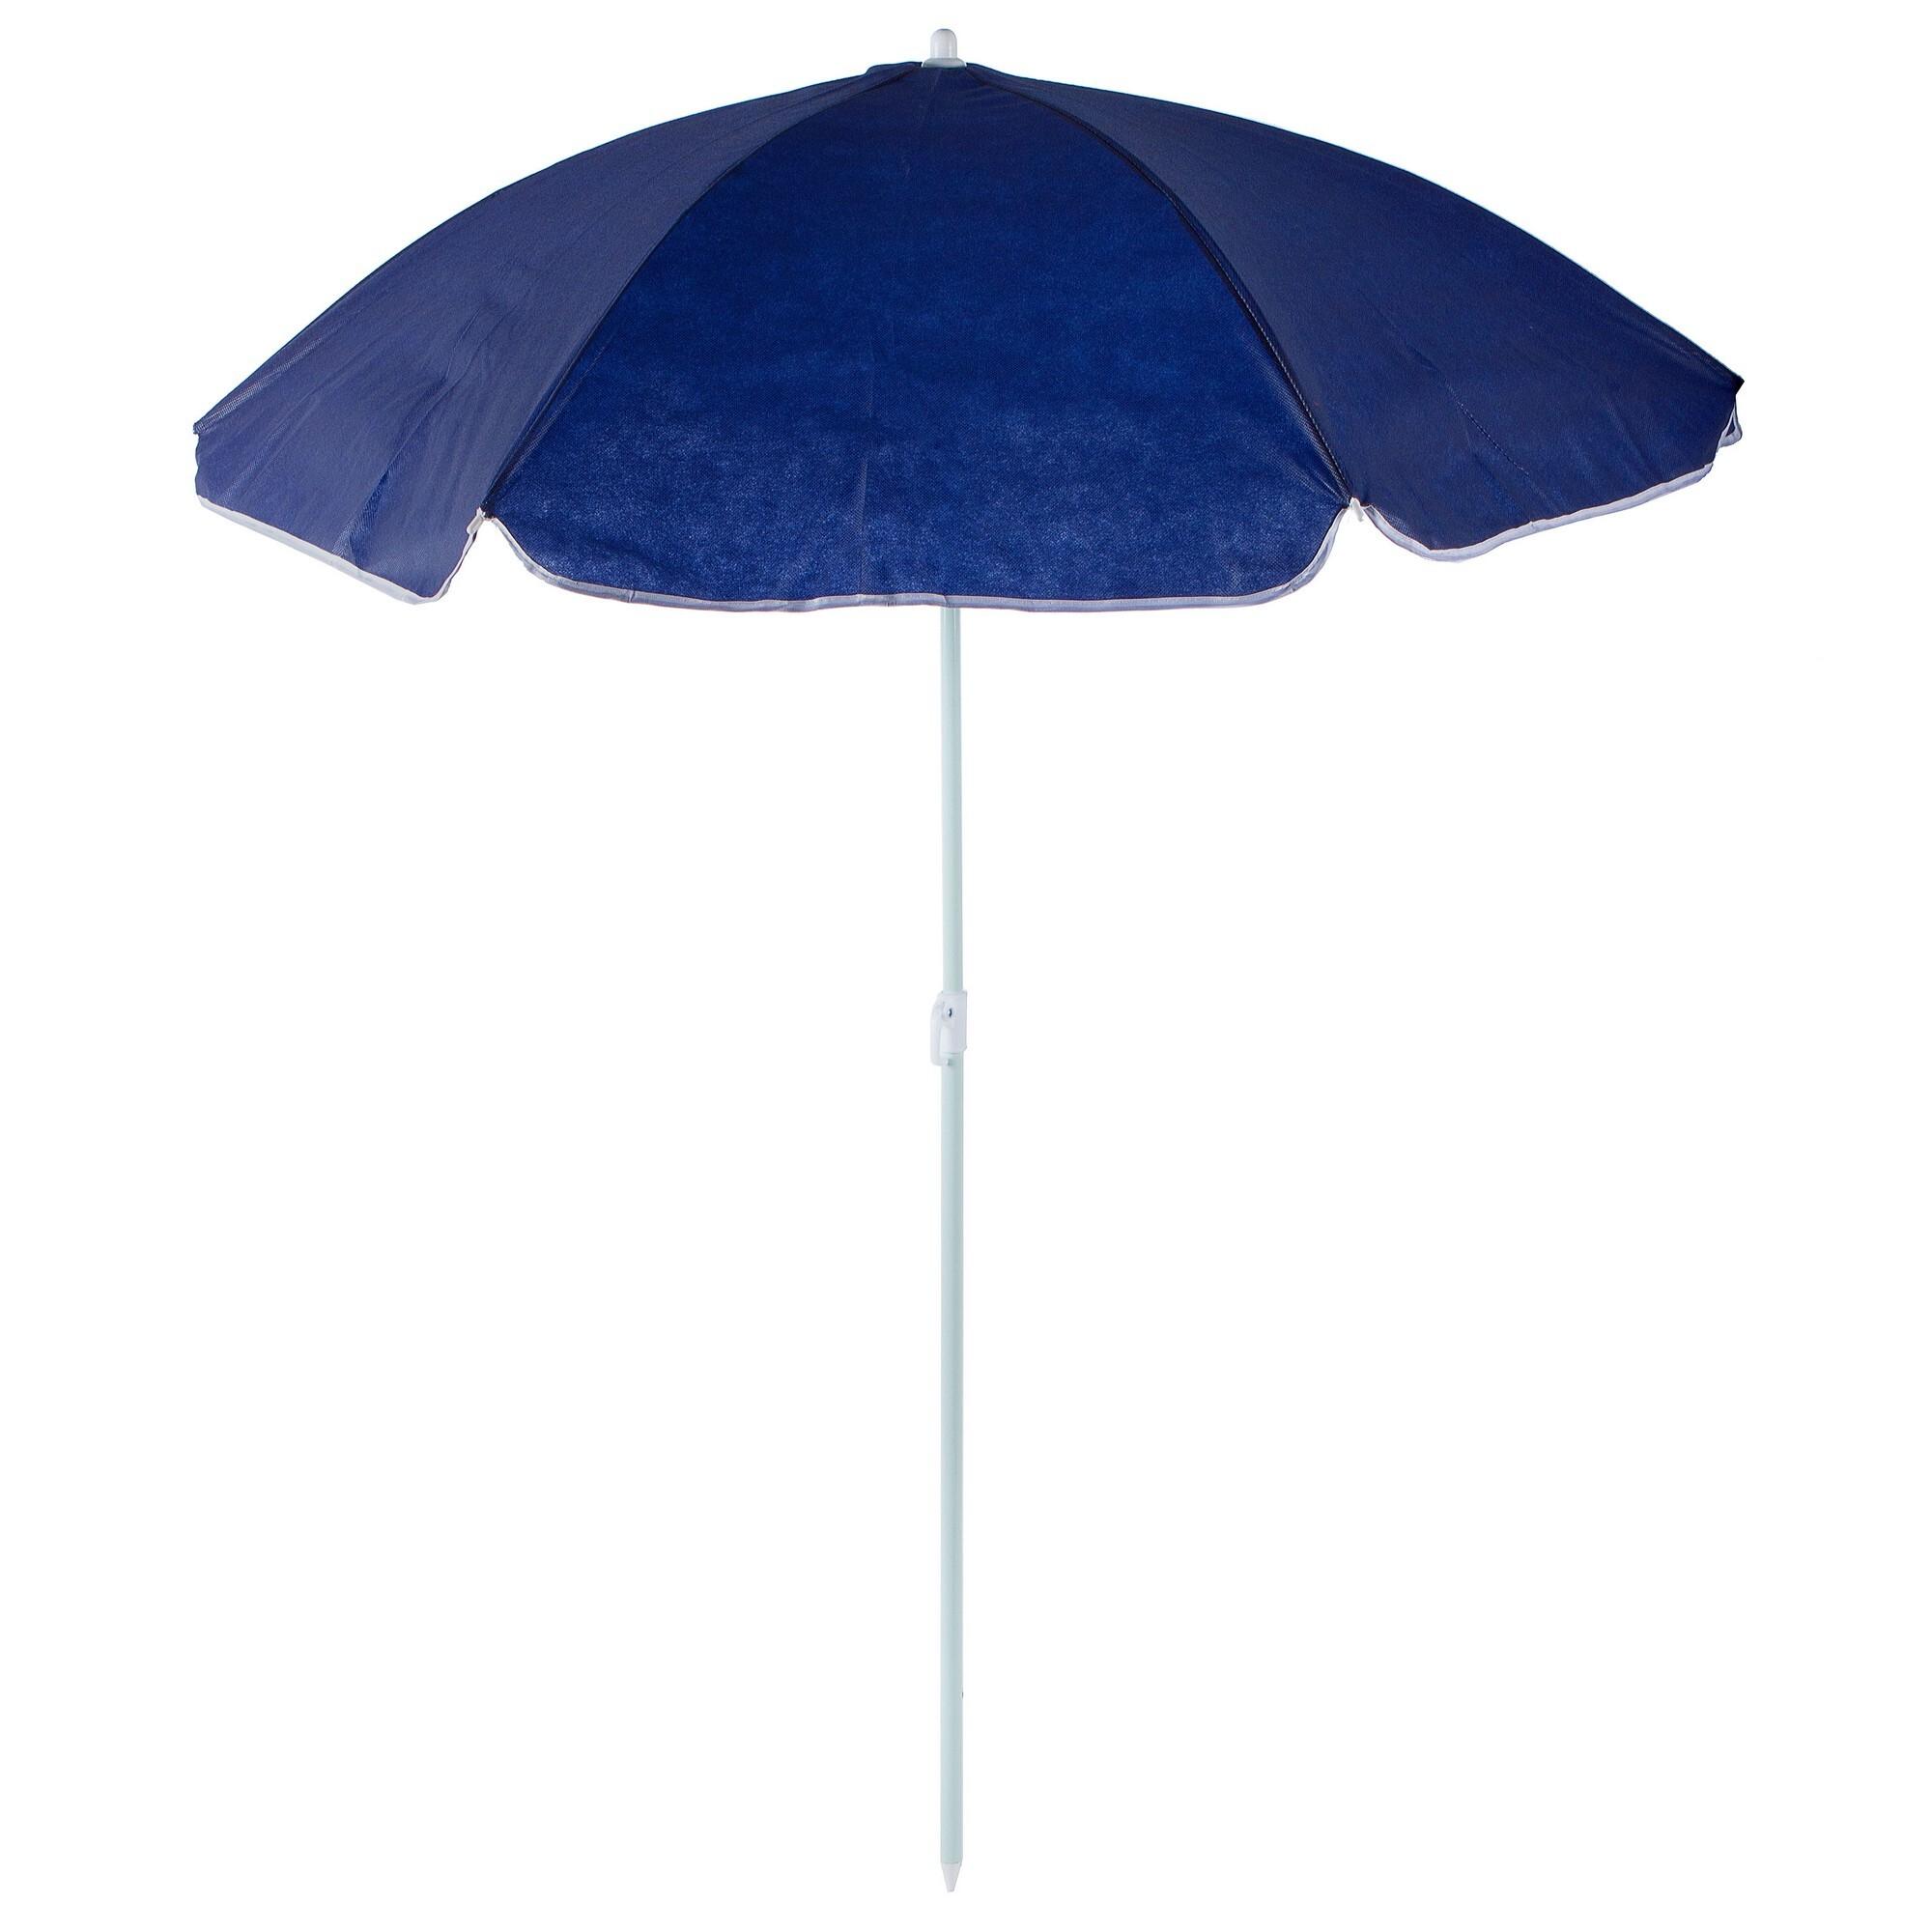 Зонт пляжный 2 м синий, металл/полиэстер